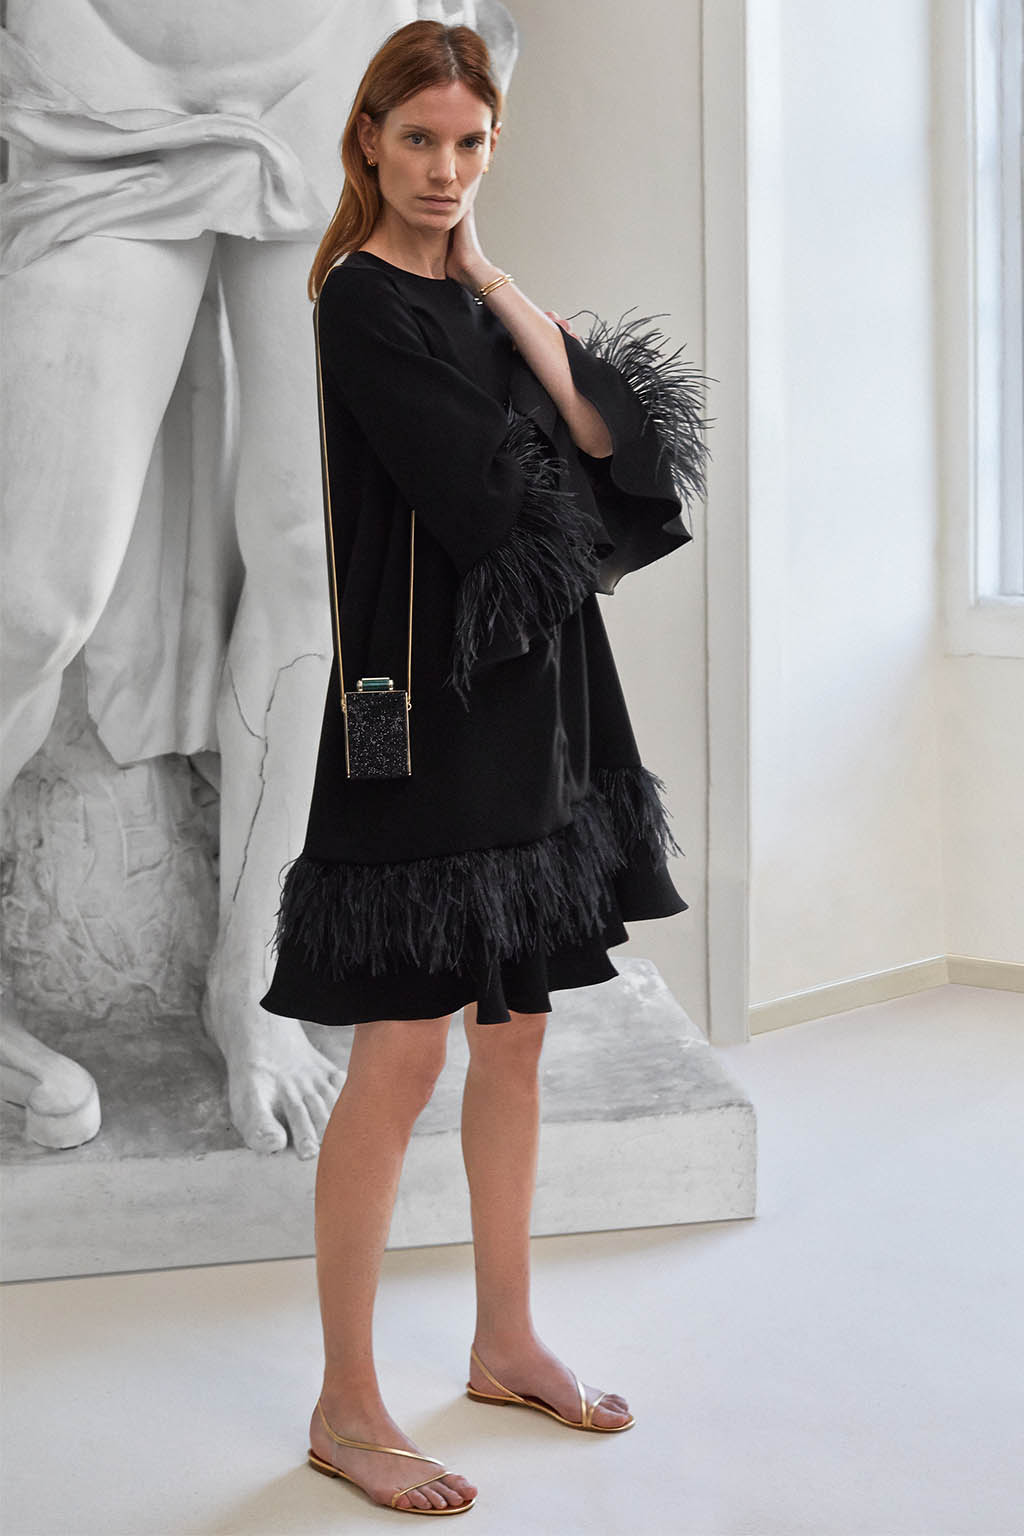 CH Carolina Herrera. New Womenswear Collection Evening. Look 08